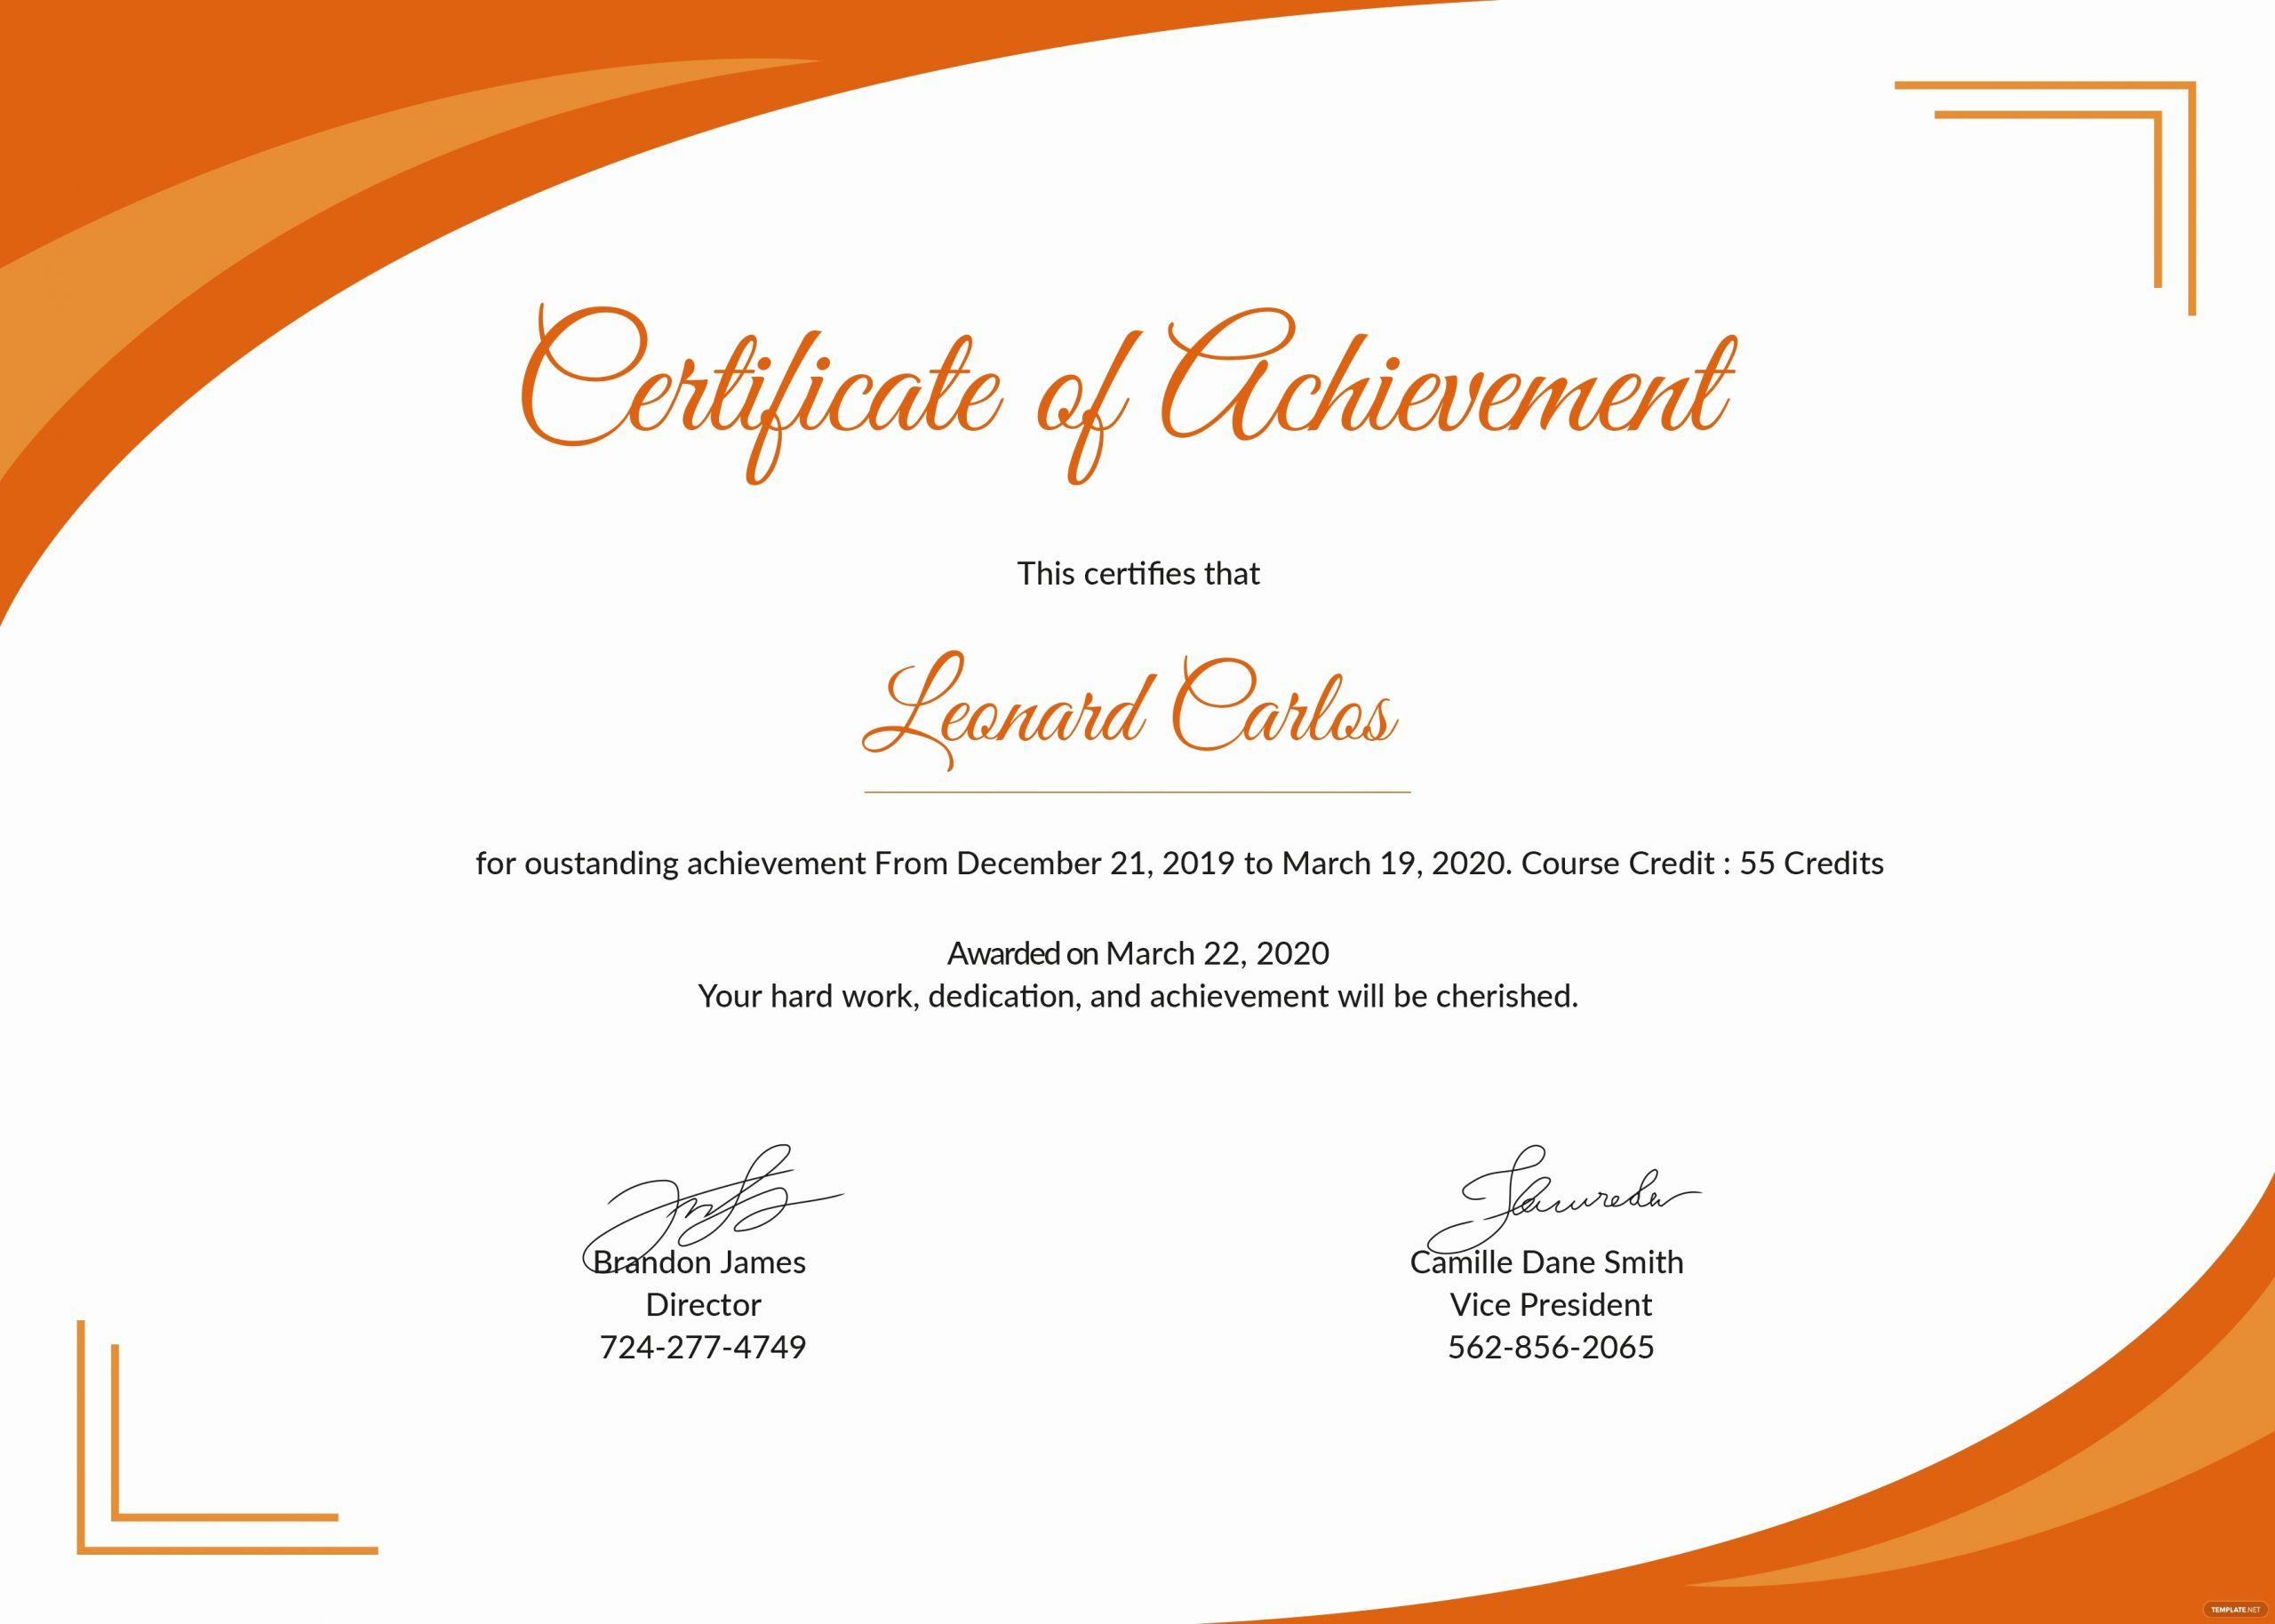 Certificate Of Achievement Template Free Inspirational Certificate Templates